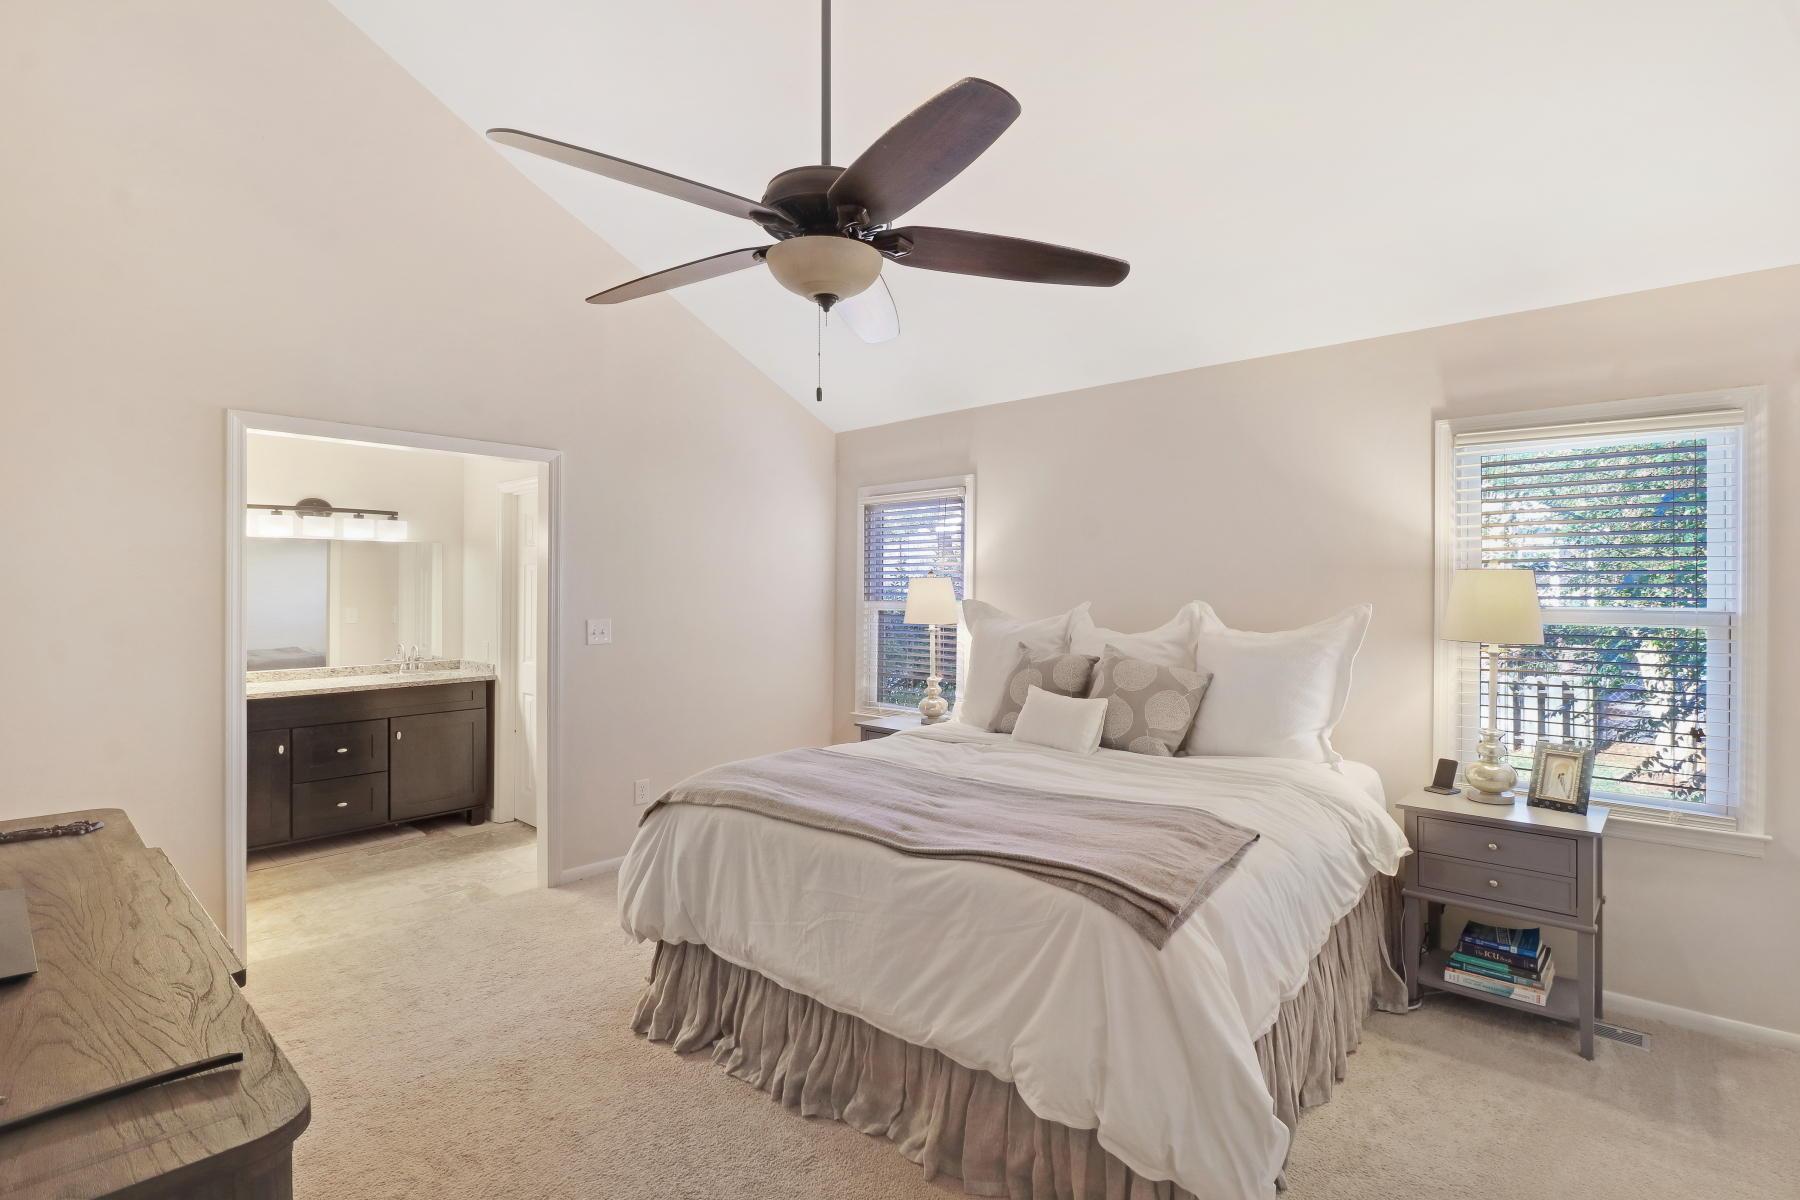 Harrison Acres Homes For Sale - 51 Markfield, Charleston, SC - 31